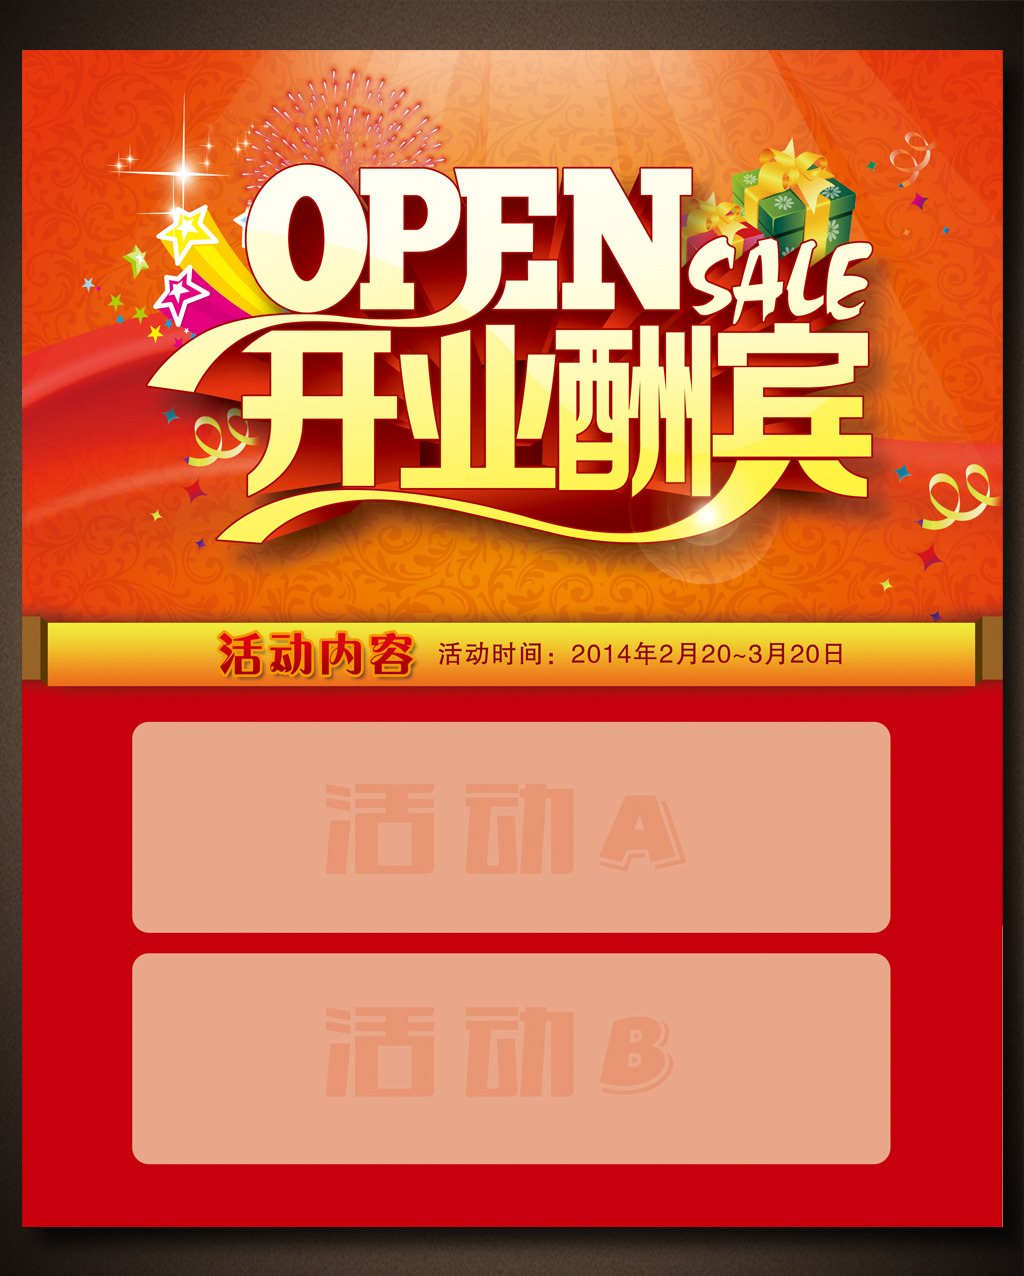 open开业酬宾商场开业海报dm券模板下载 open开业酬宾商场开业海报dm